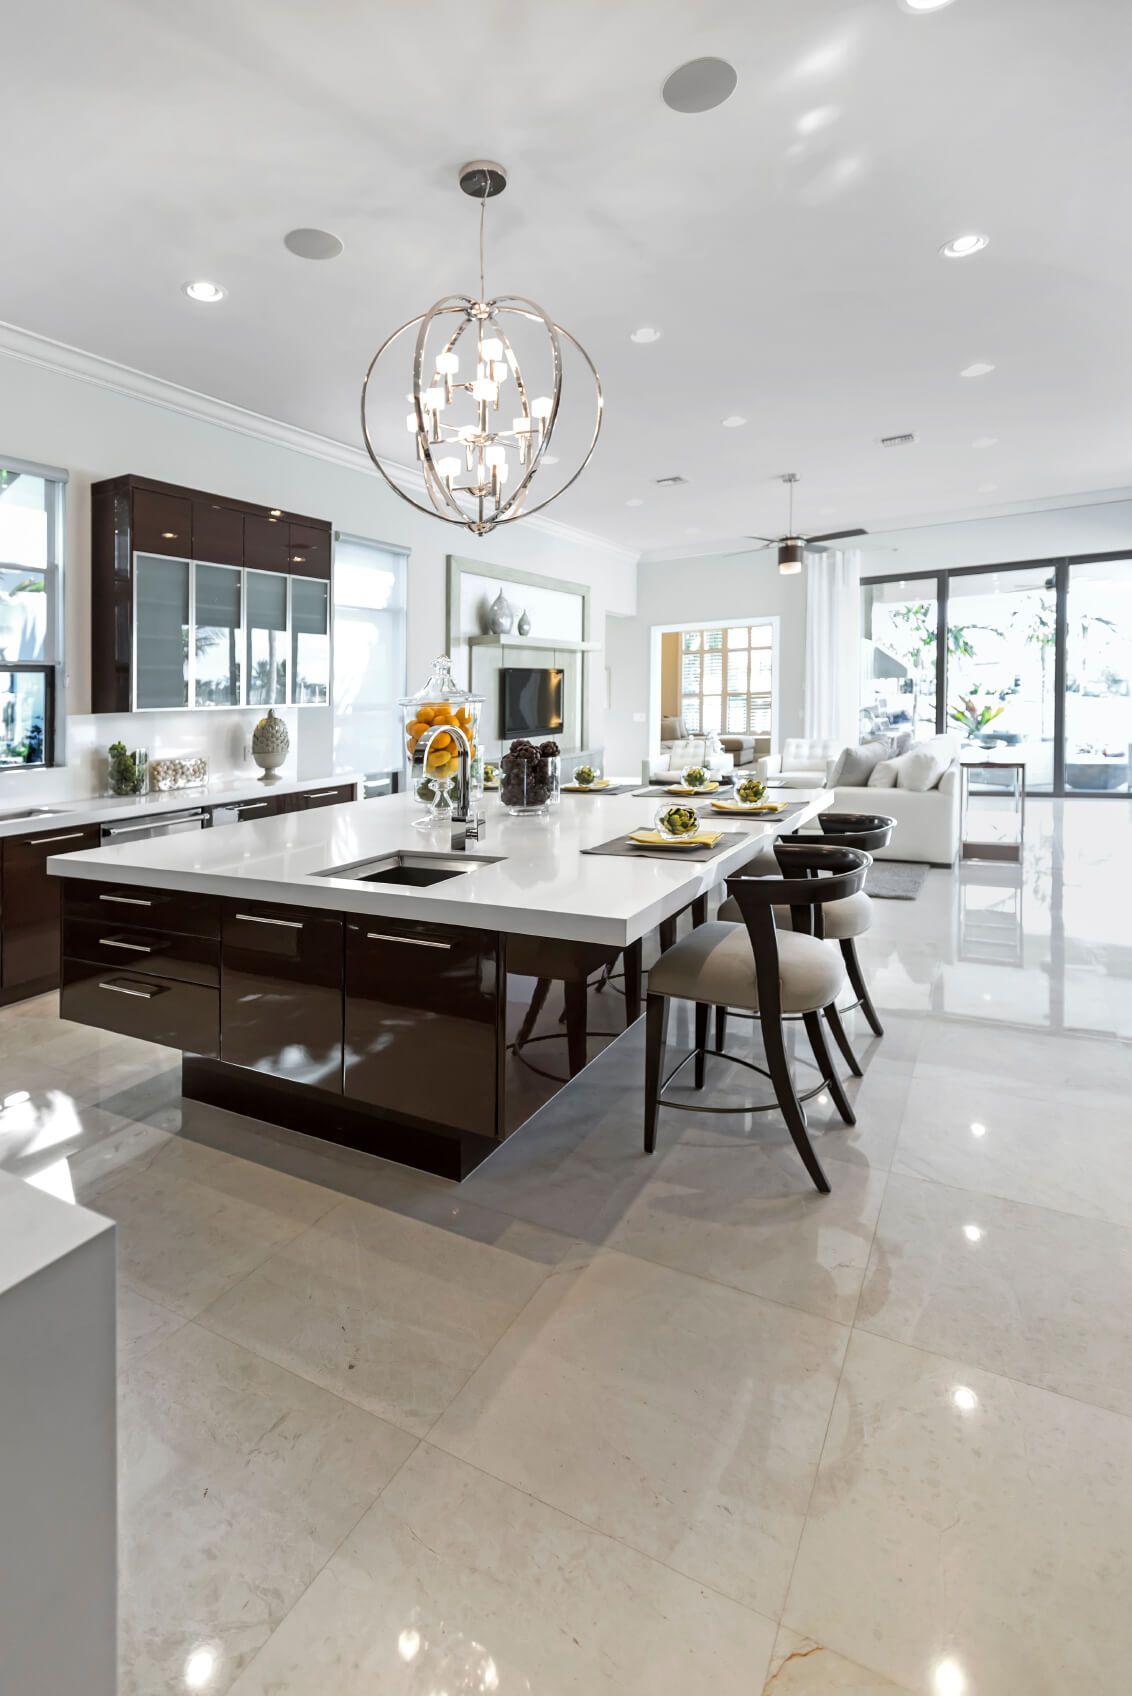 Large Modern White And Dark Brown Kitchen With Huge Island Breakfast Bar